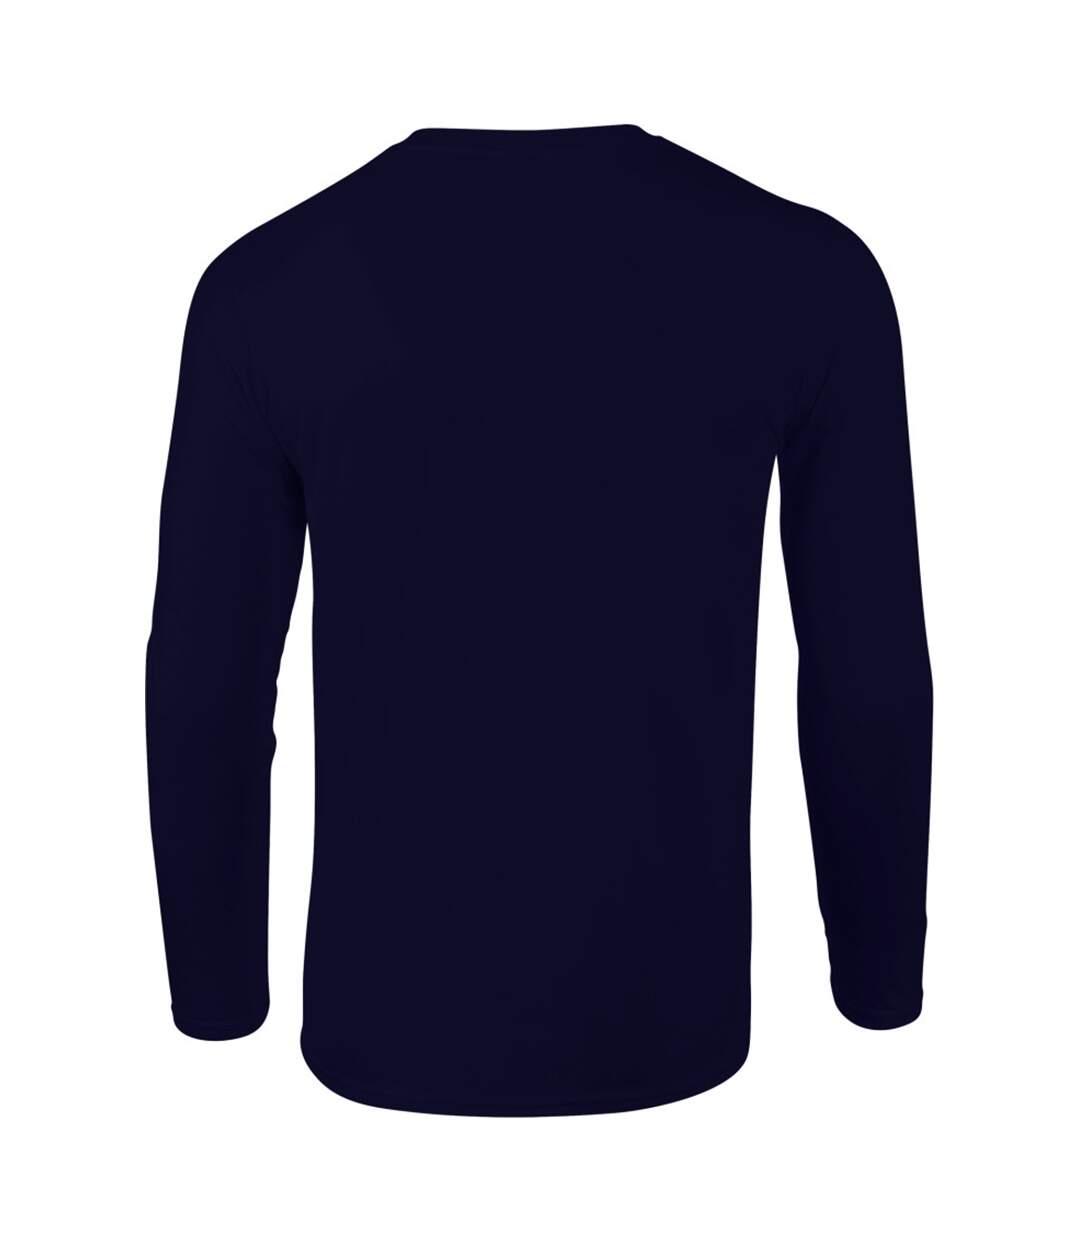 Gildan Mens Soft Style Long Sleeve T-Shirt (Navy) - UTBC488